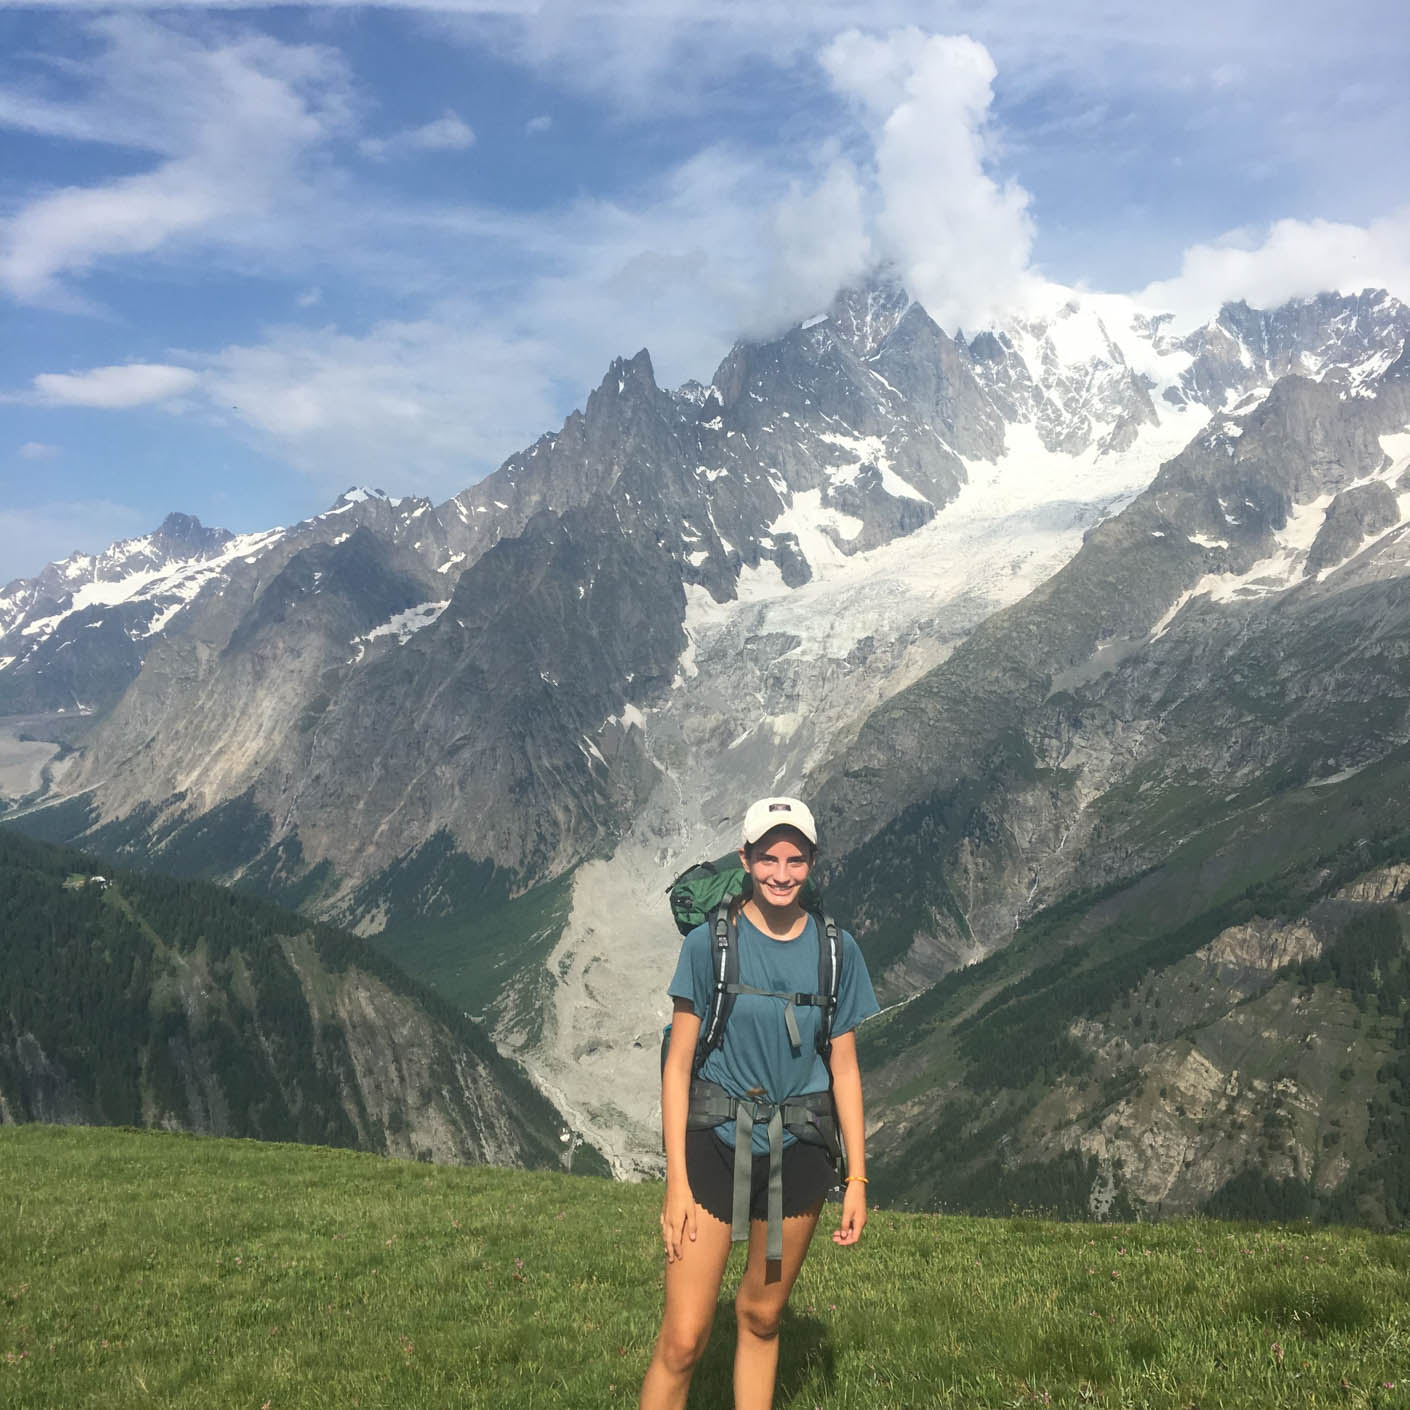 Europe Alps Explorer backpacking